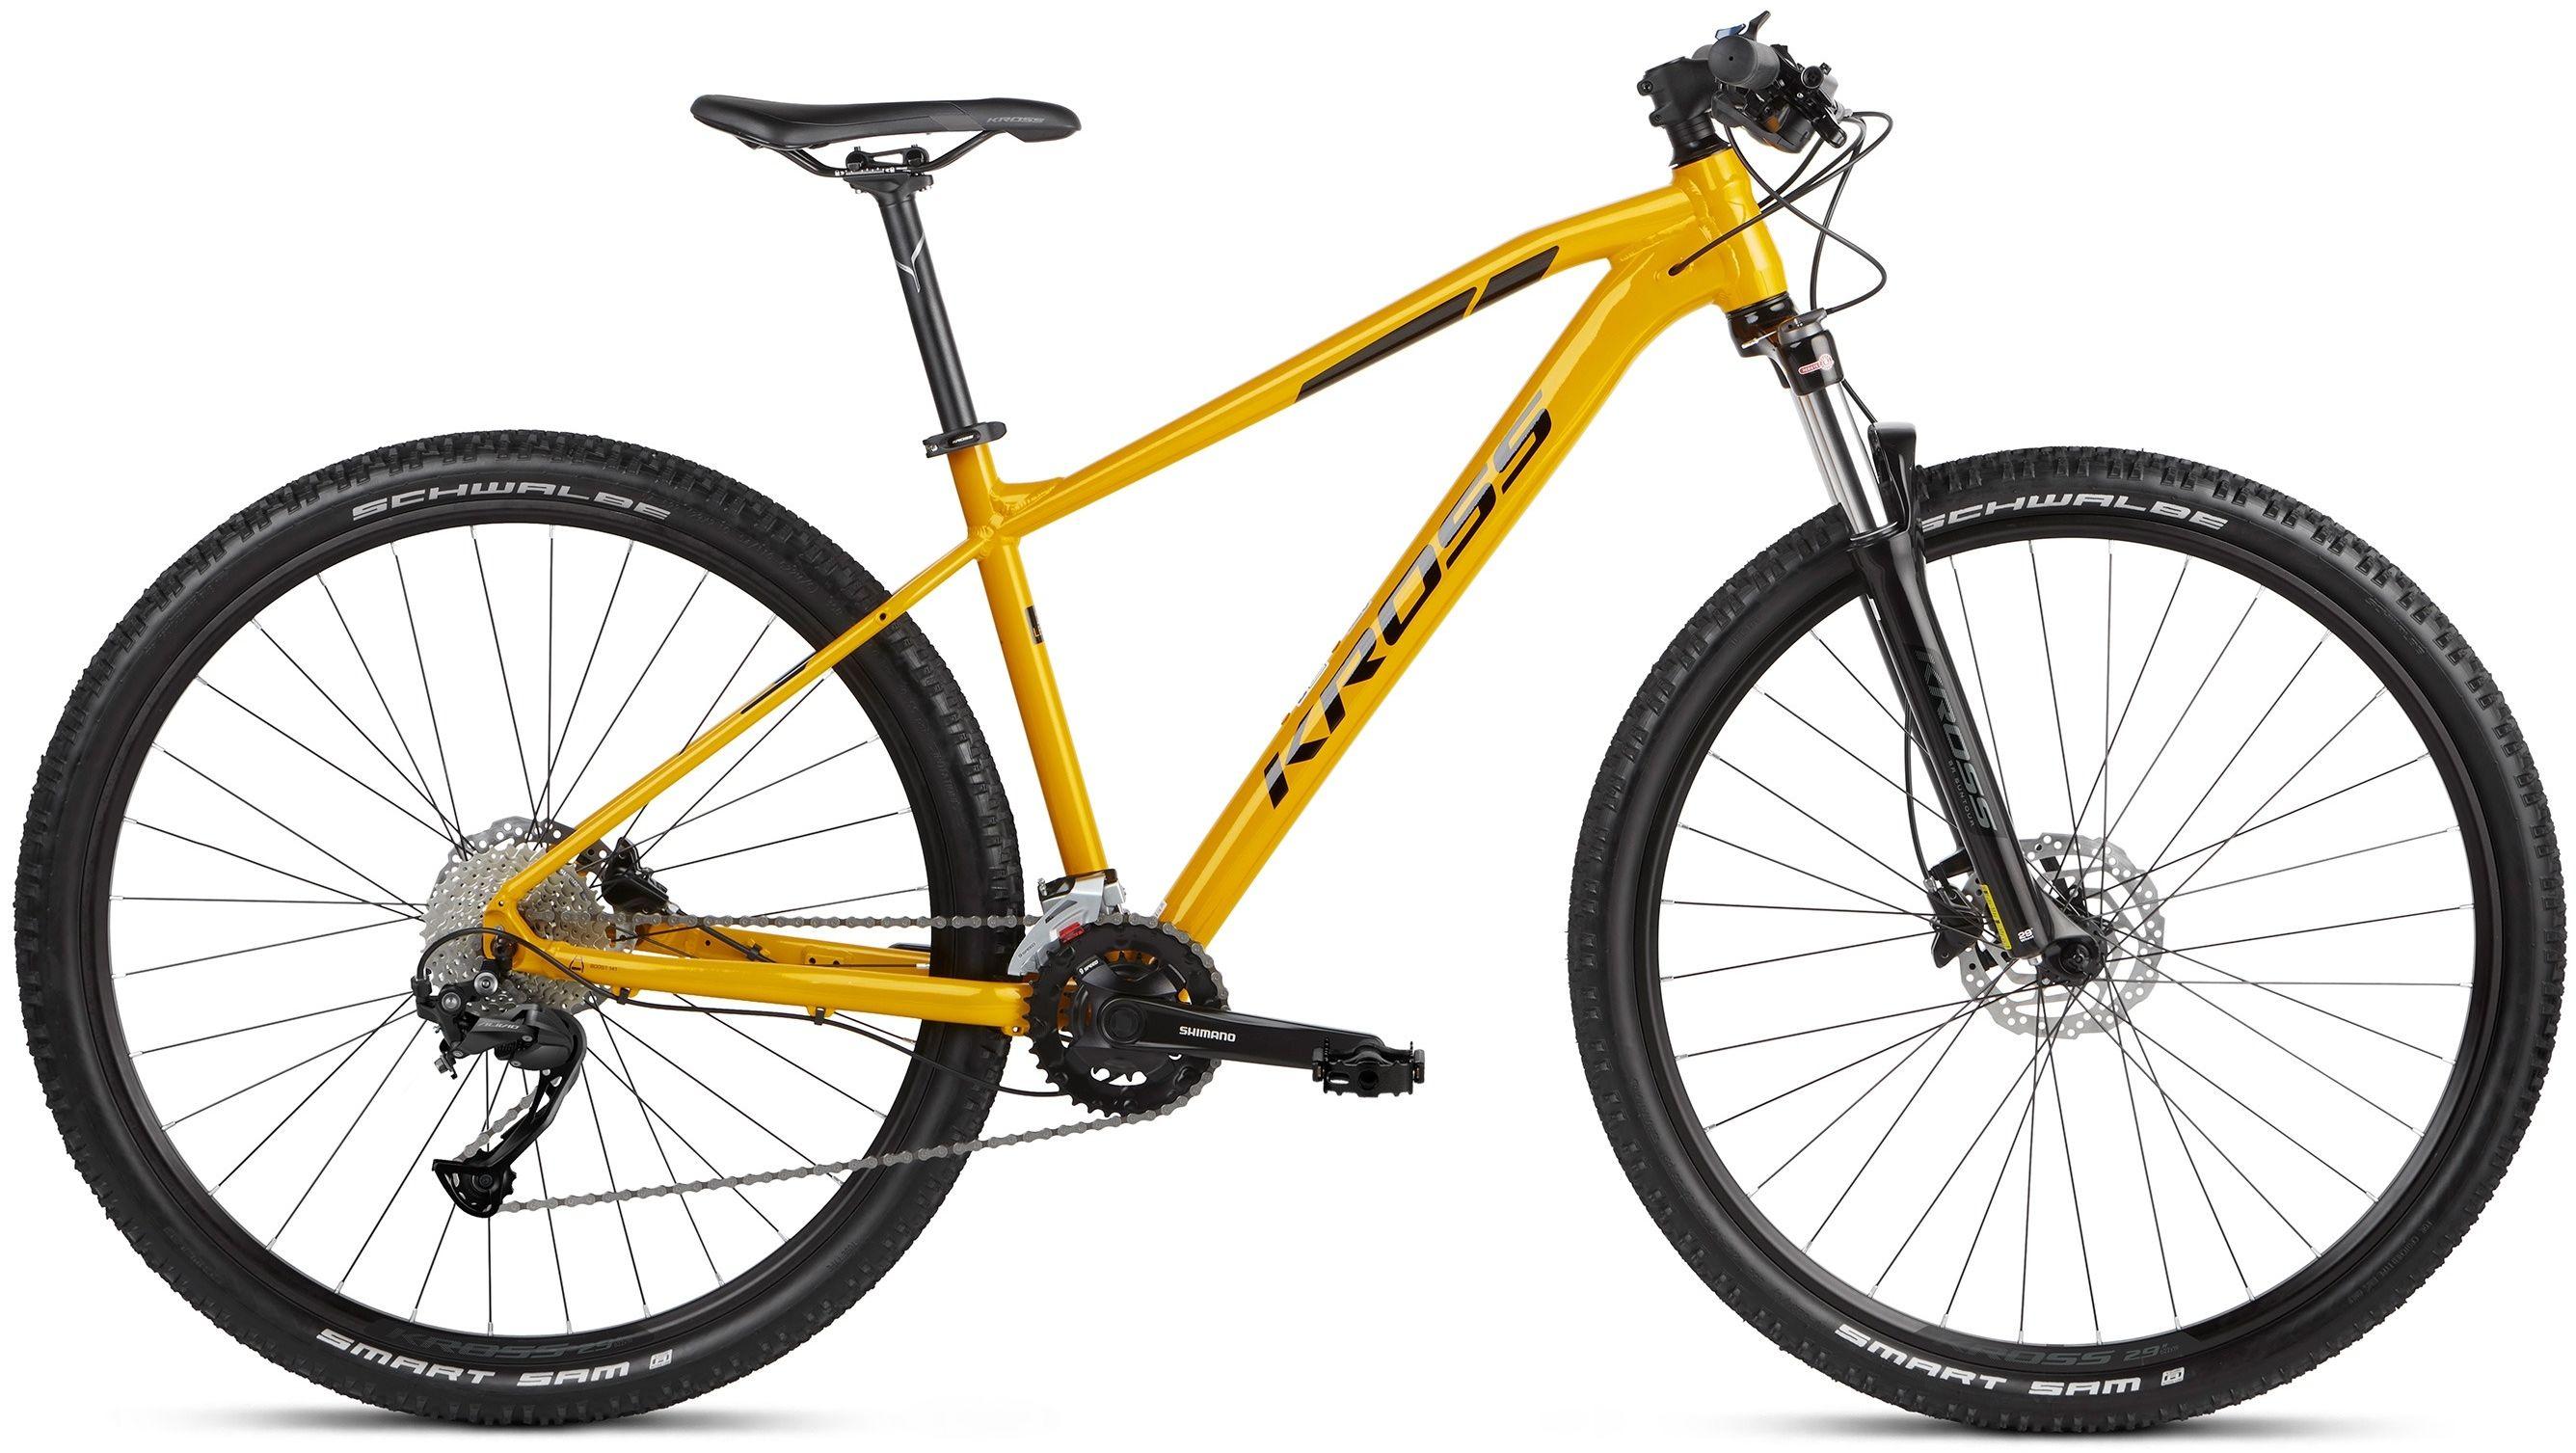 "Rower Kross LEVEL 2.0 SR 21 żółty 29"" 2021"